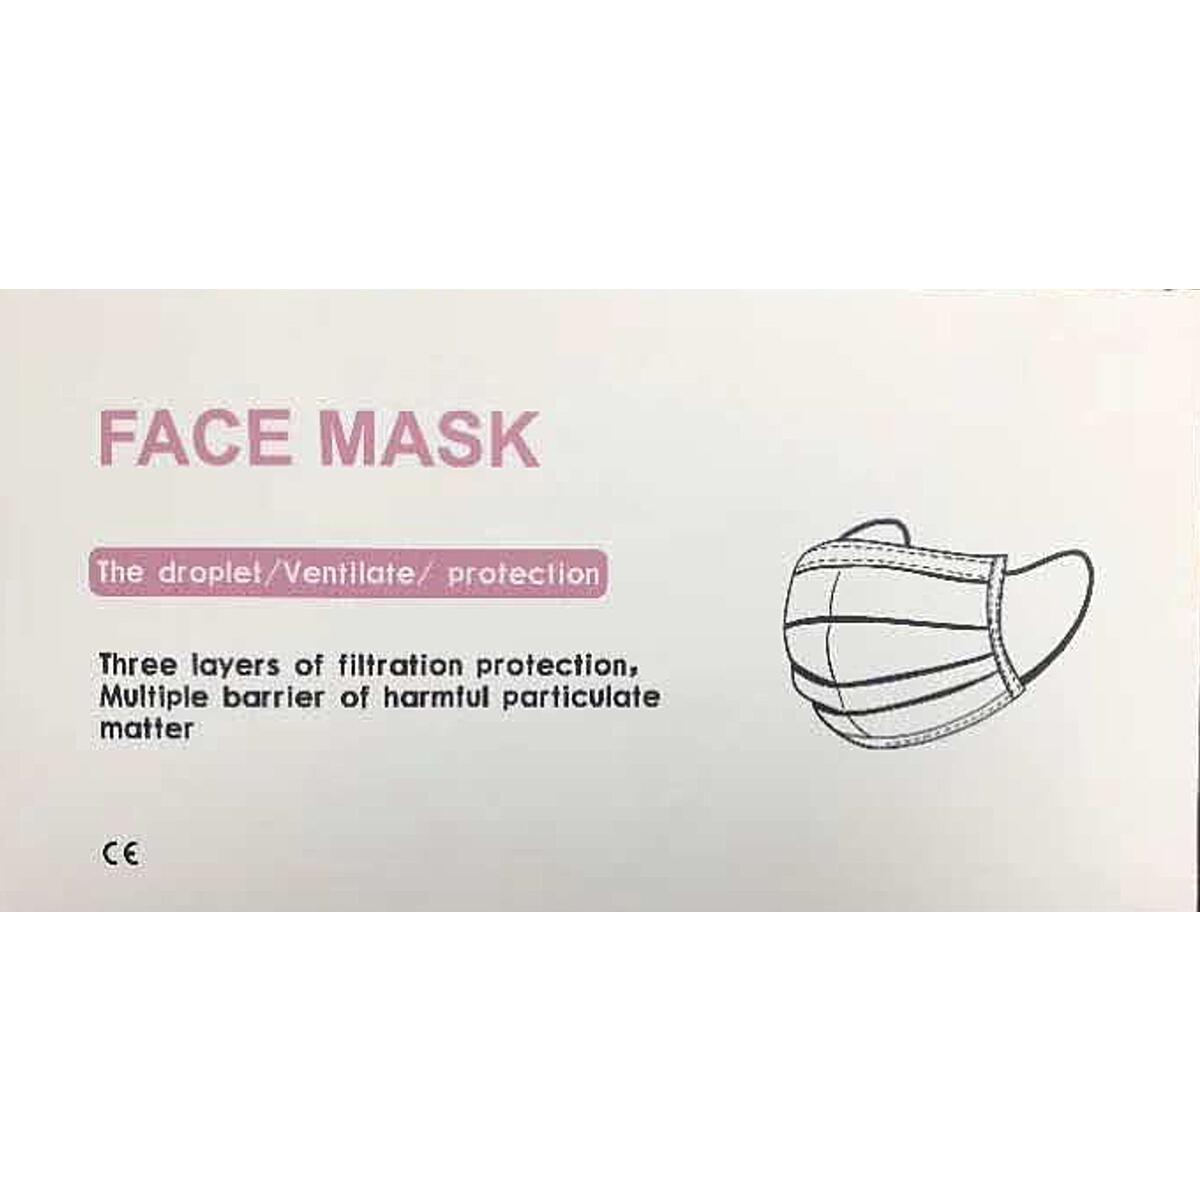 50pcs Disposable 3 Layer Respiratory Face Masks